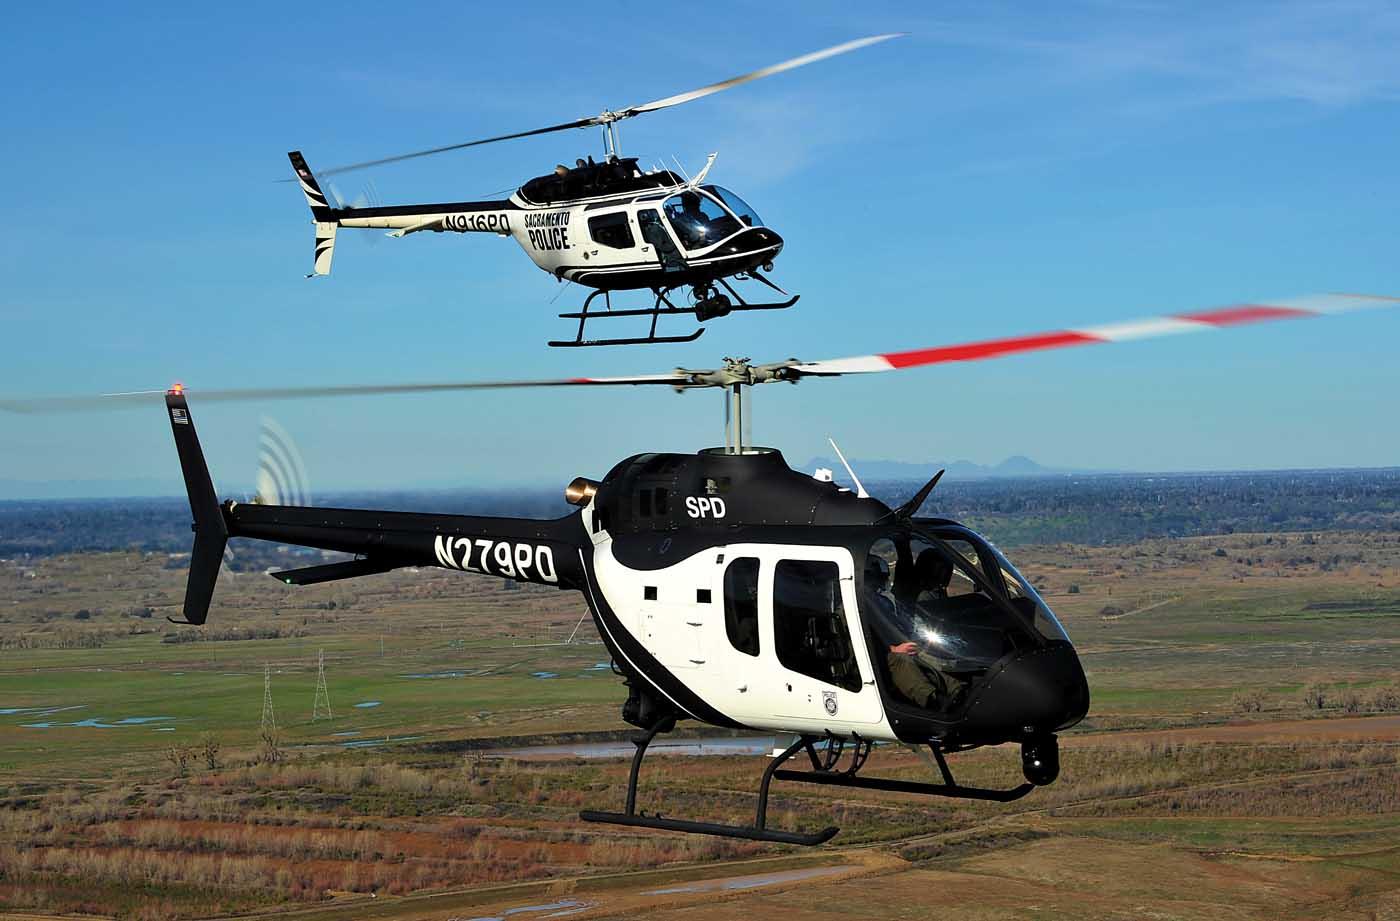 New to the beat: SPD's Bell 505 Jet Ranger X - Vertical Magazine